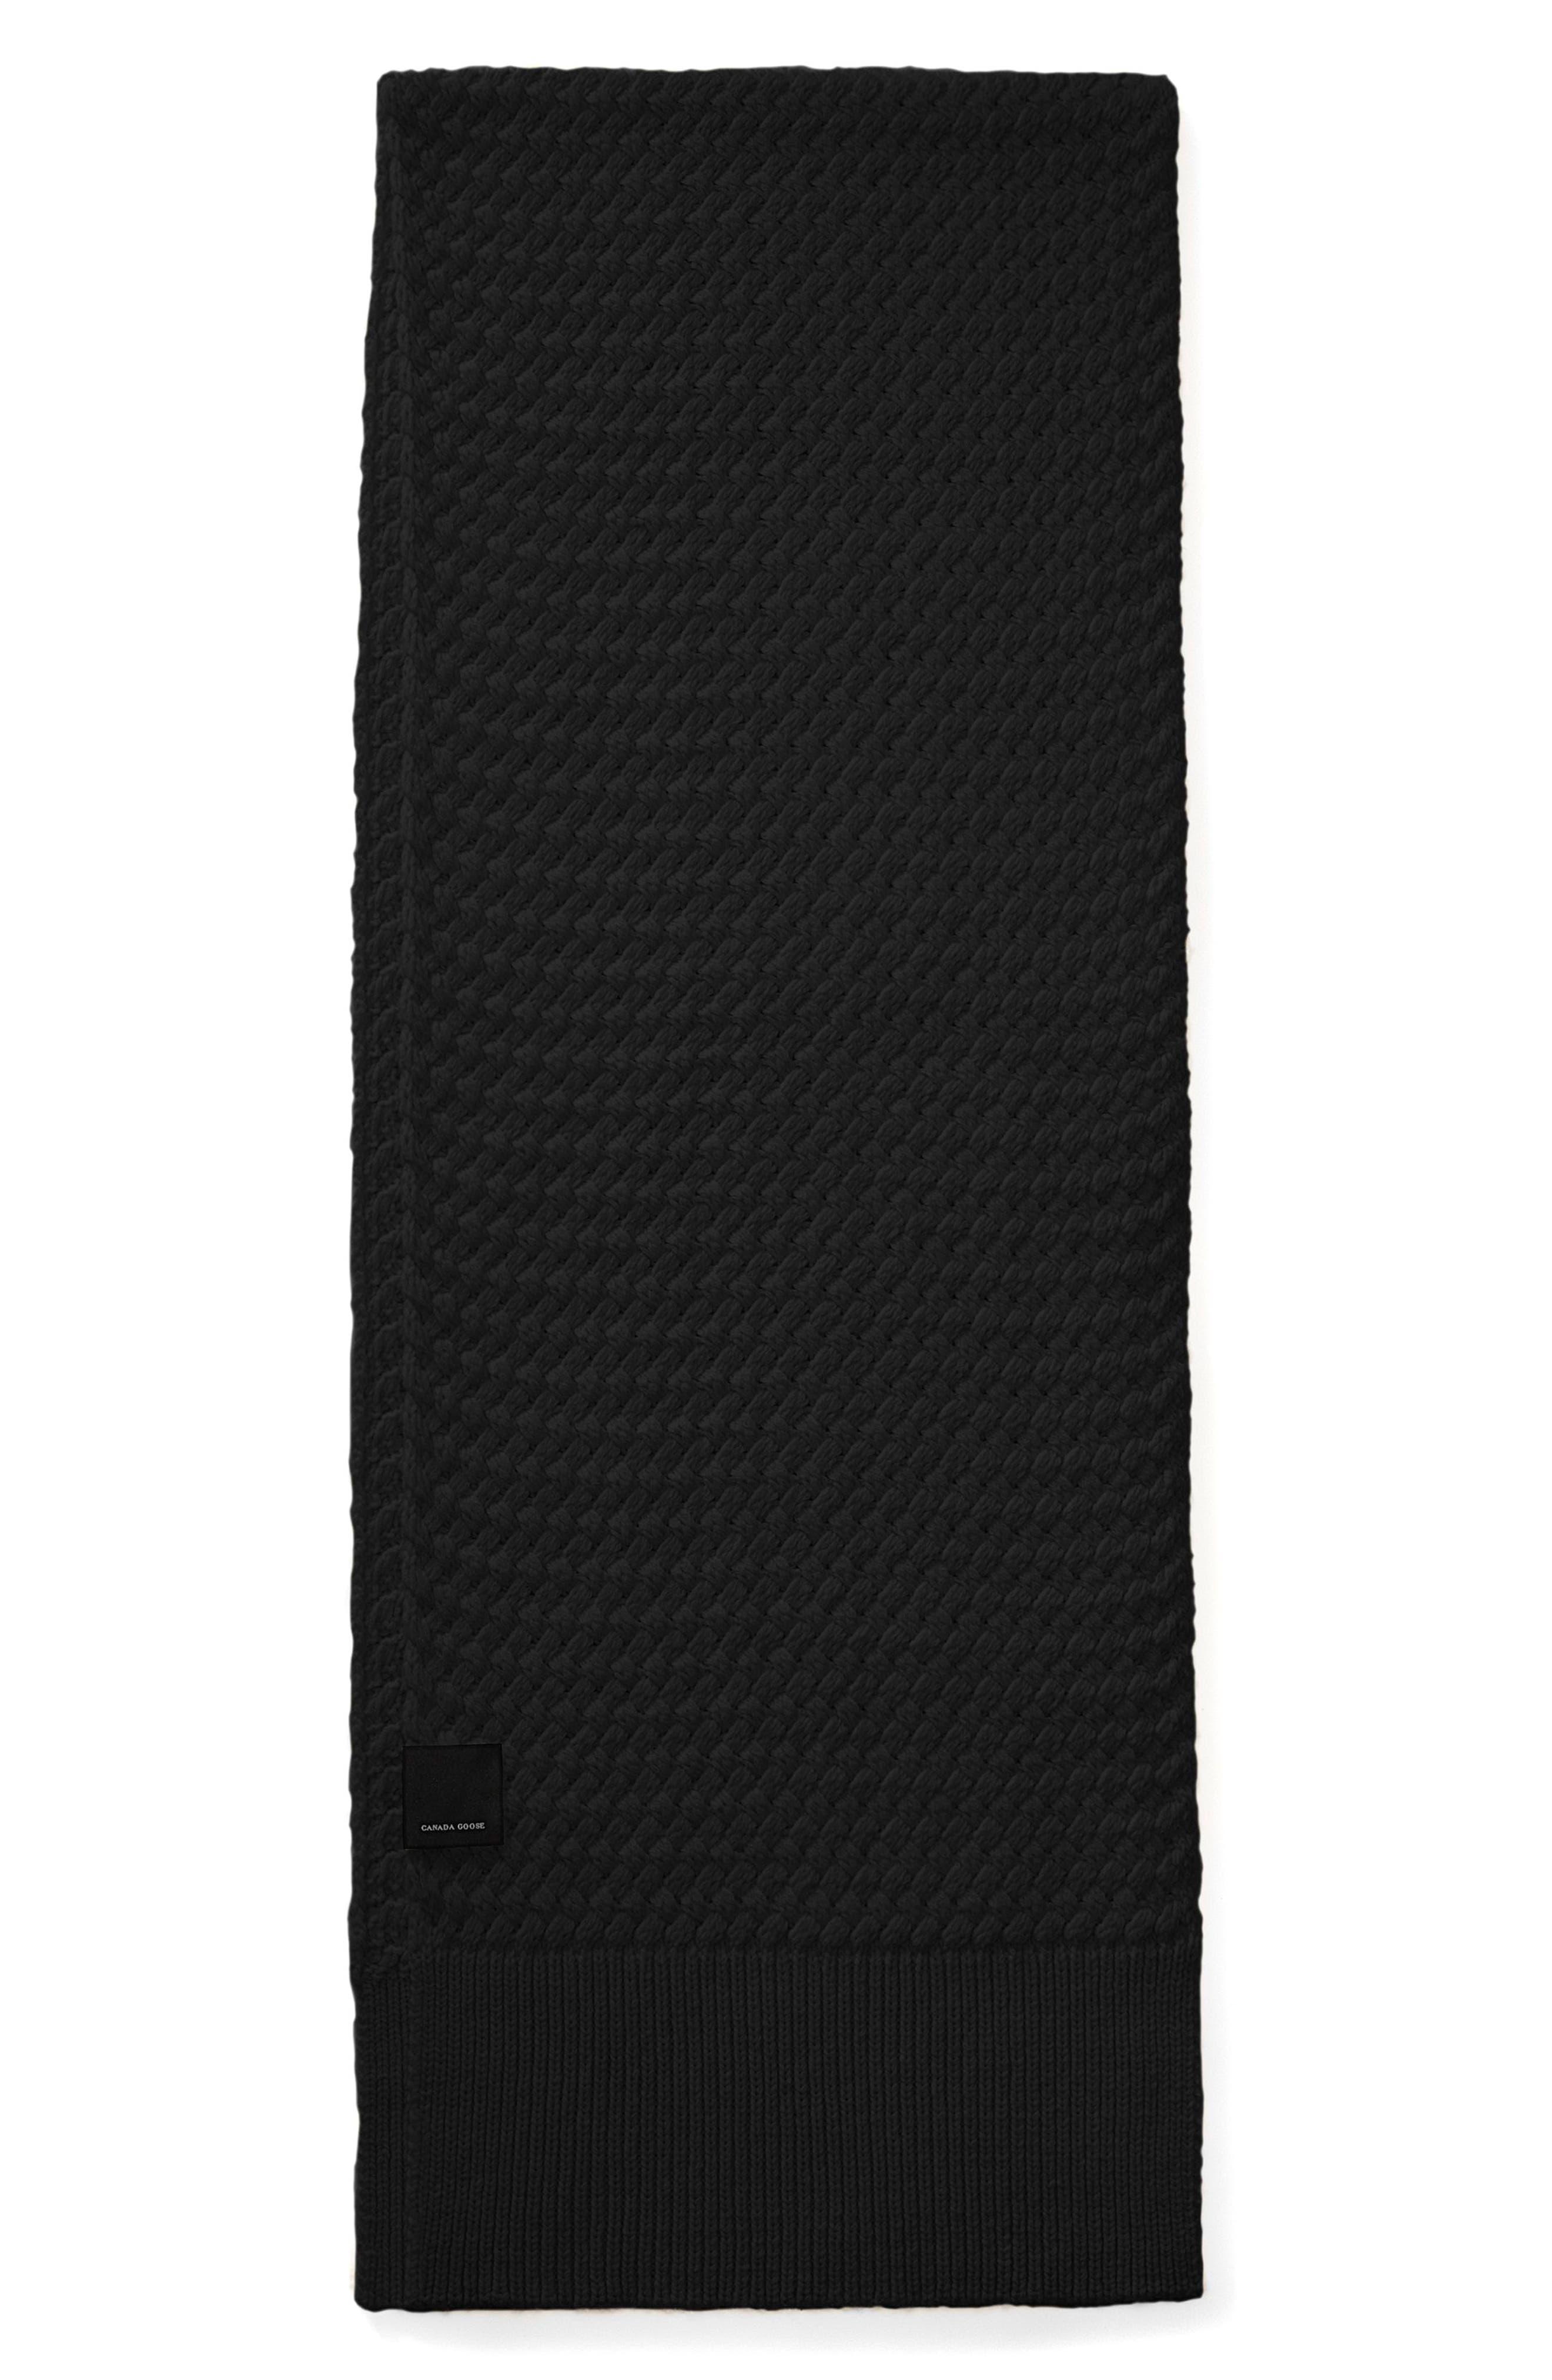 Basket Weave Merino Wool Scarf,                             Main thumbnail 1, color,                             BLACK